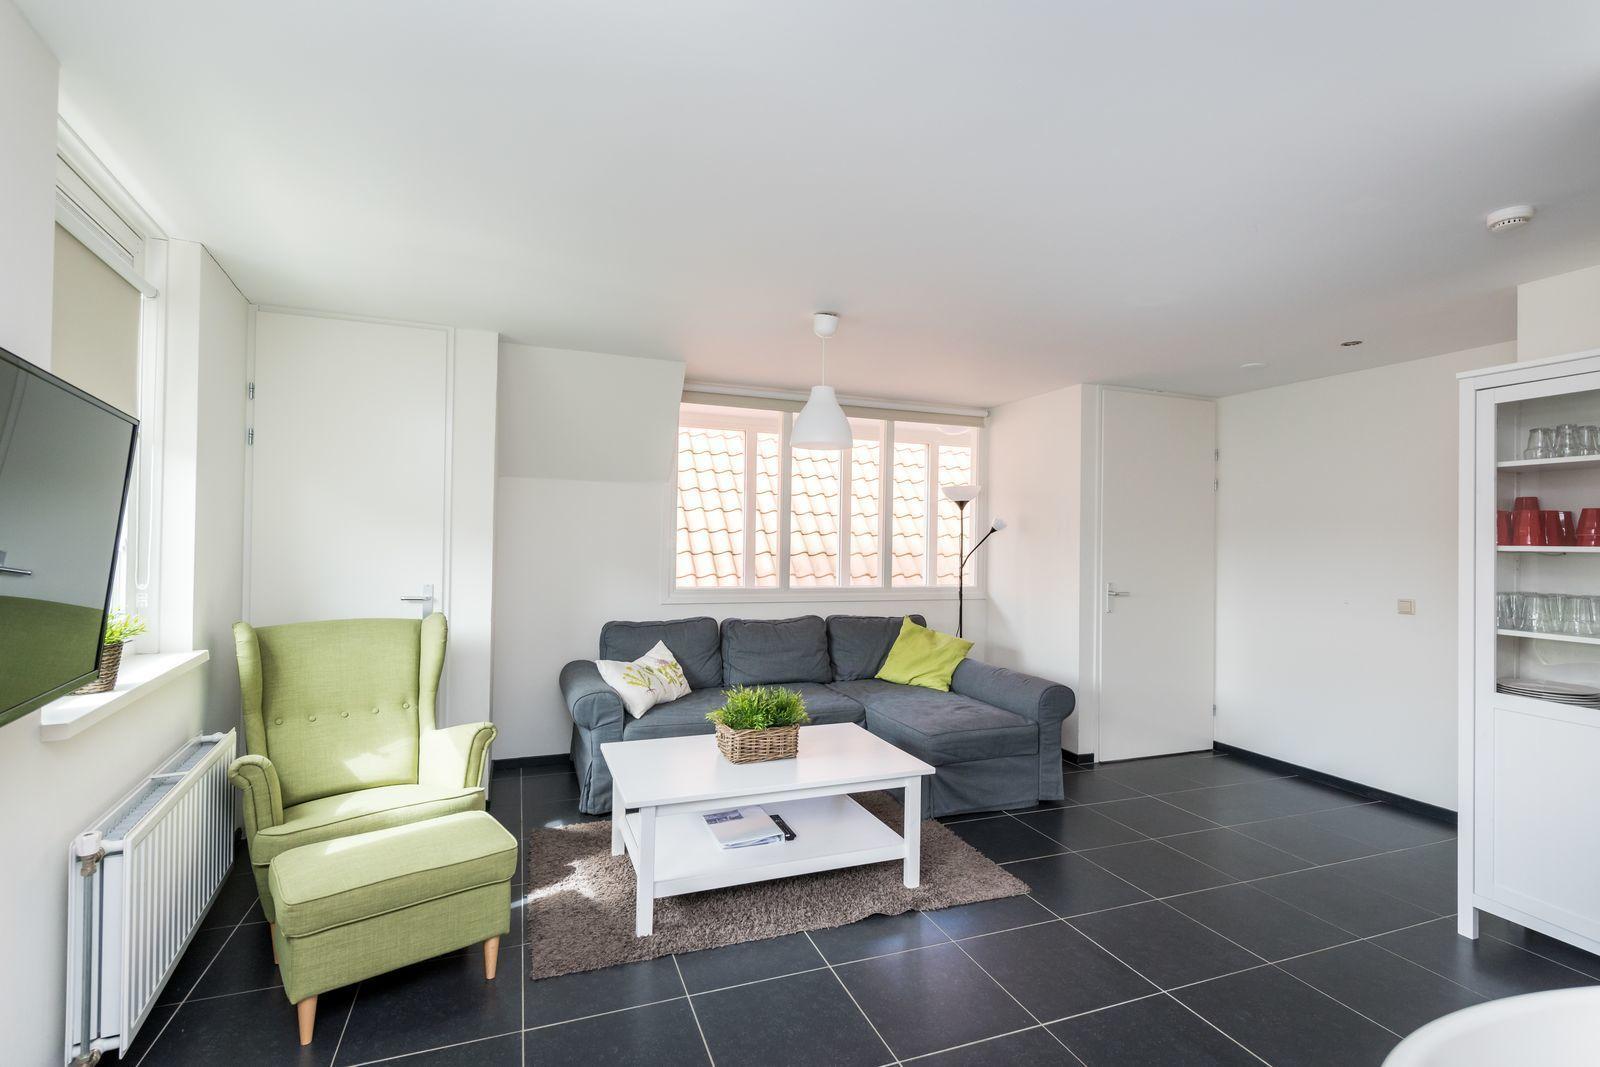 Weststraat 20 - Ouddorp - Appartement Kompas